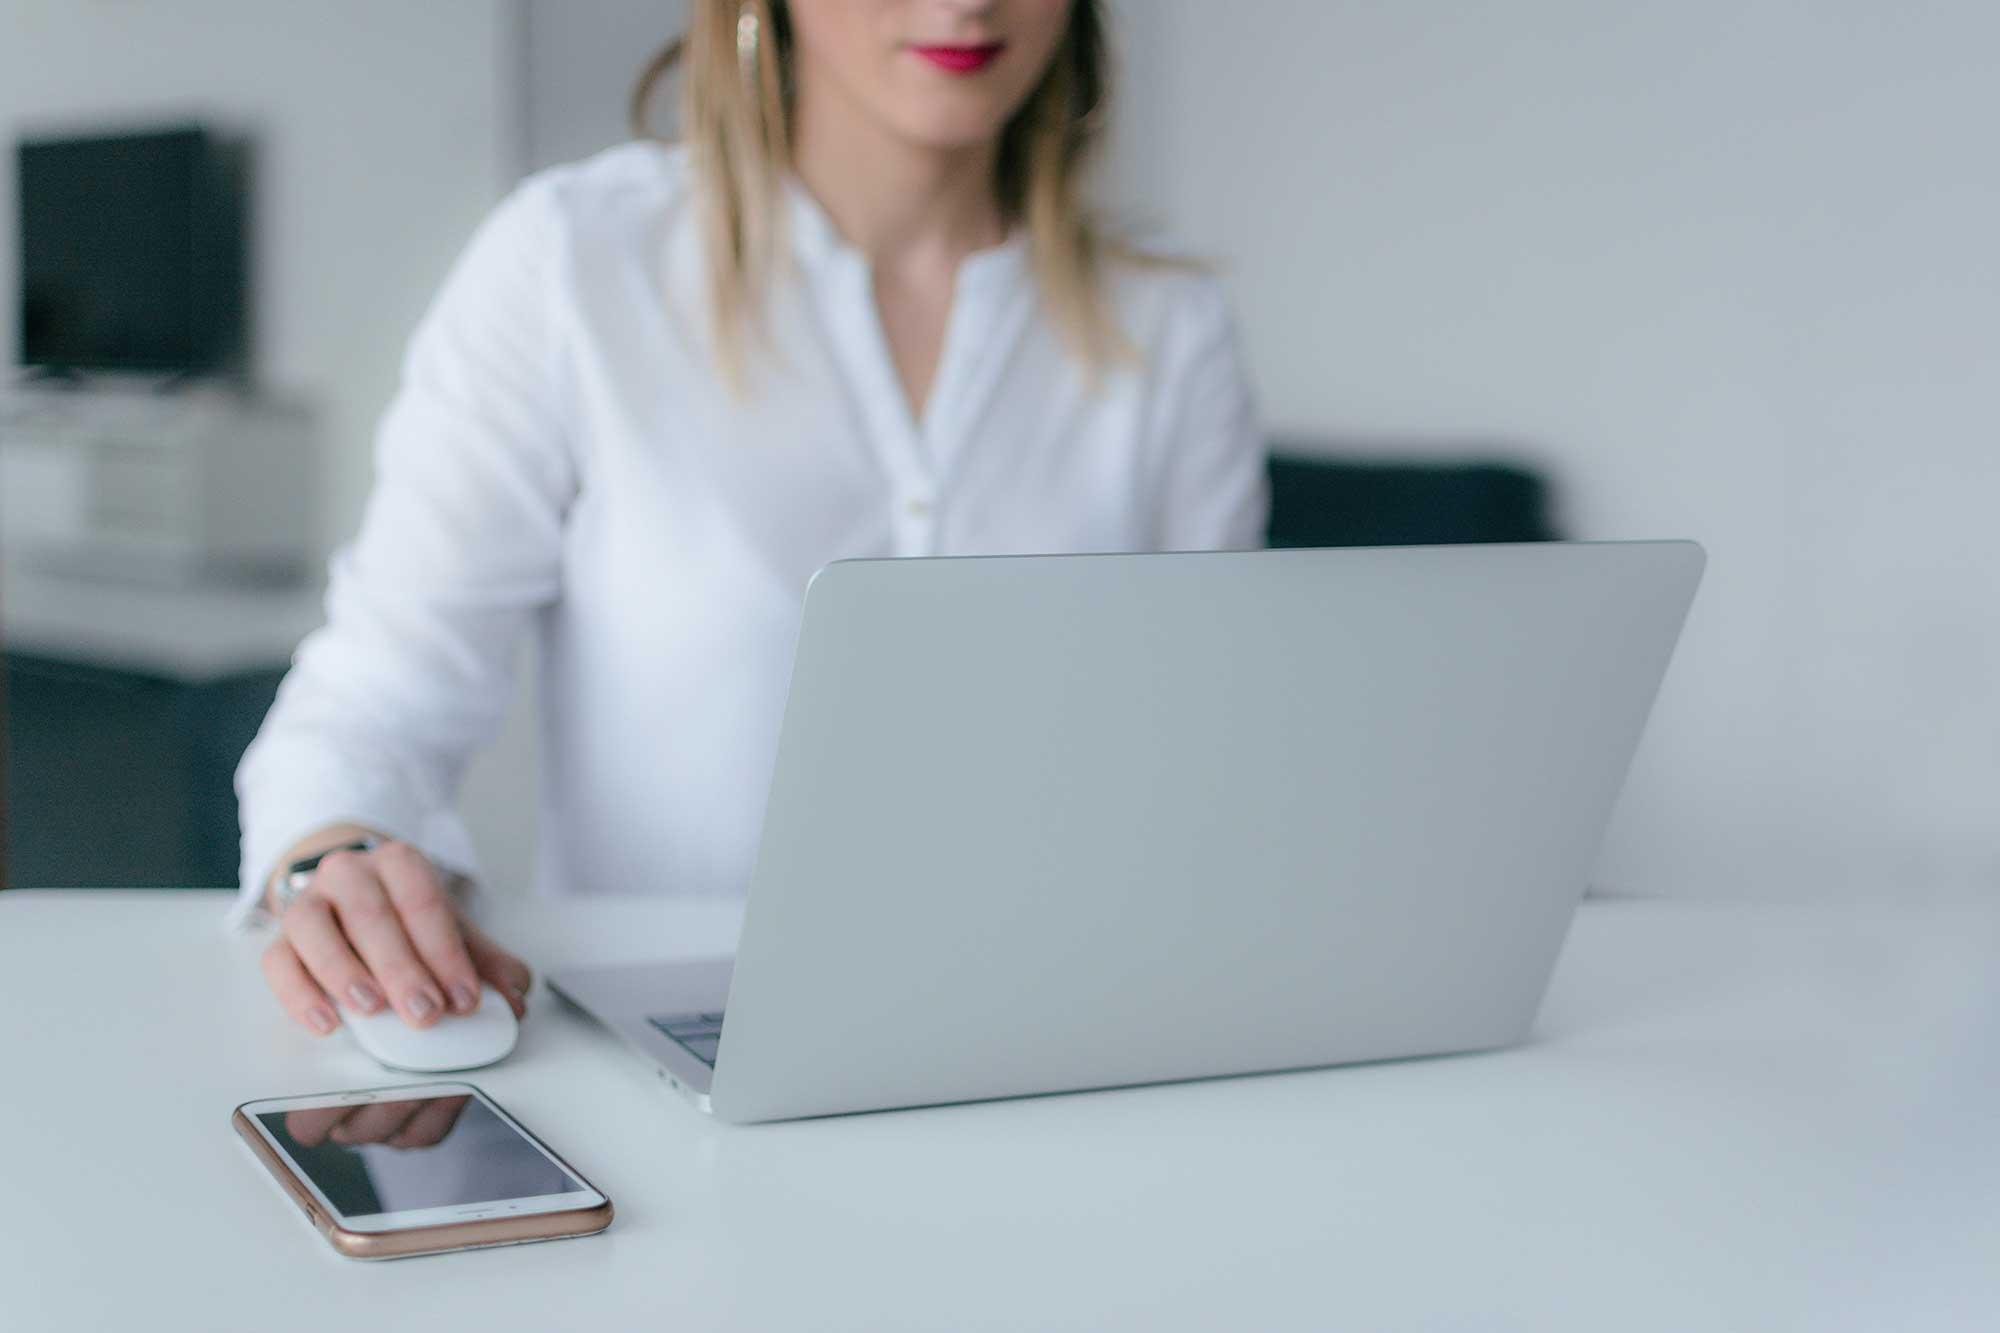 Woman working at laptop